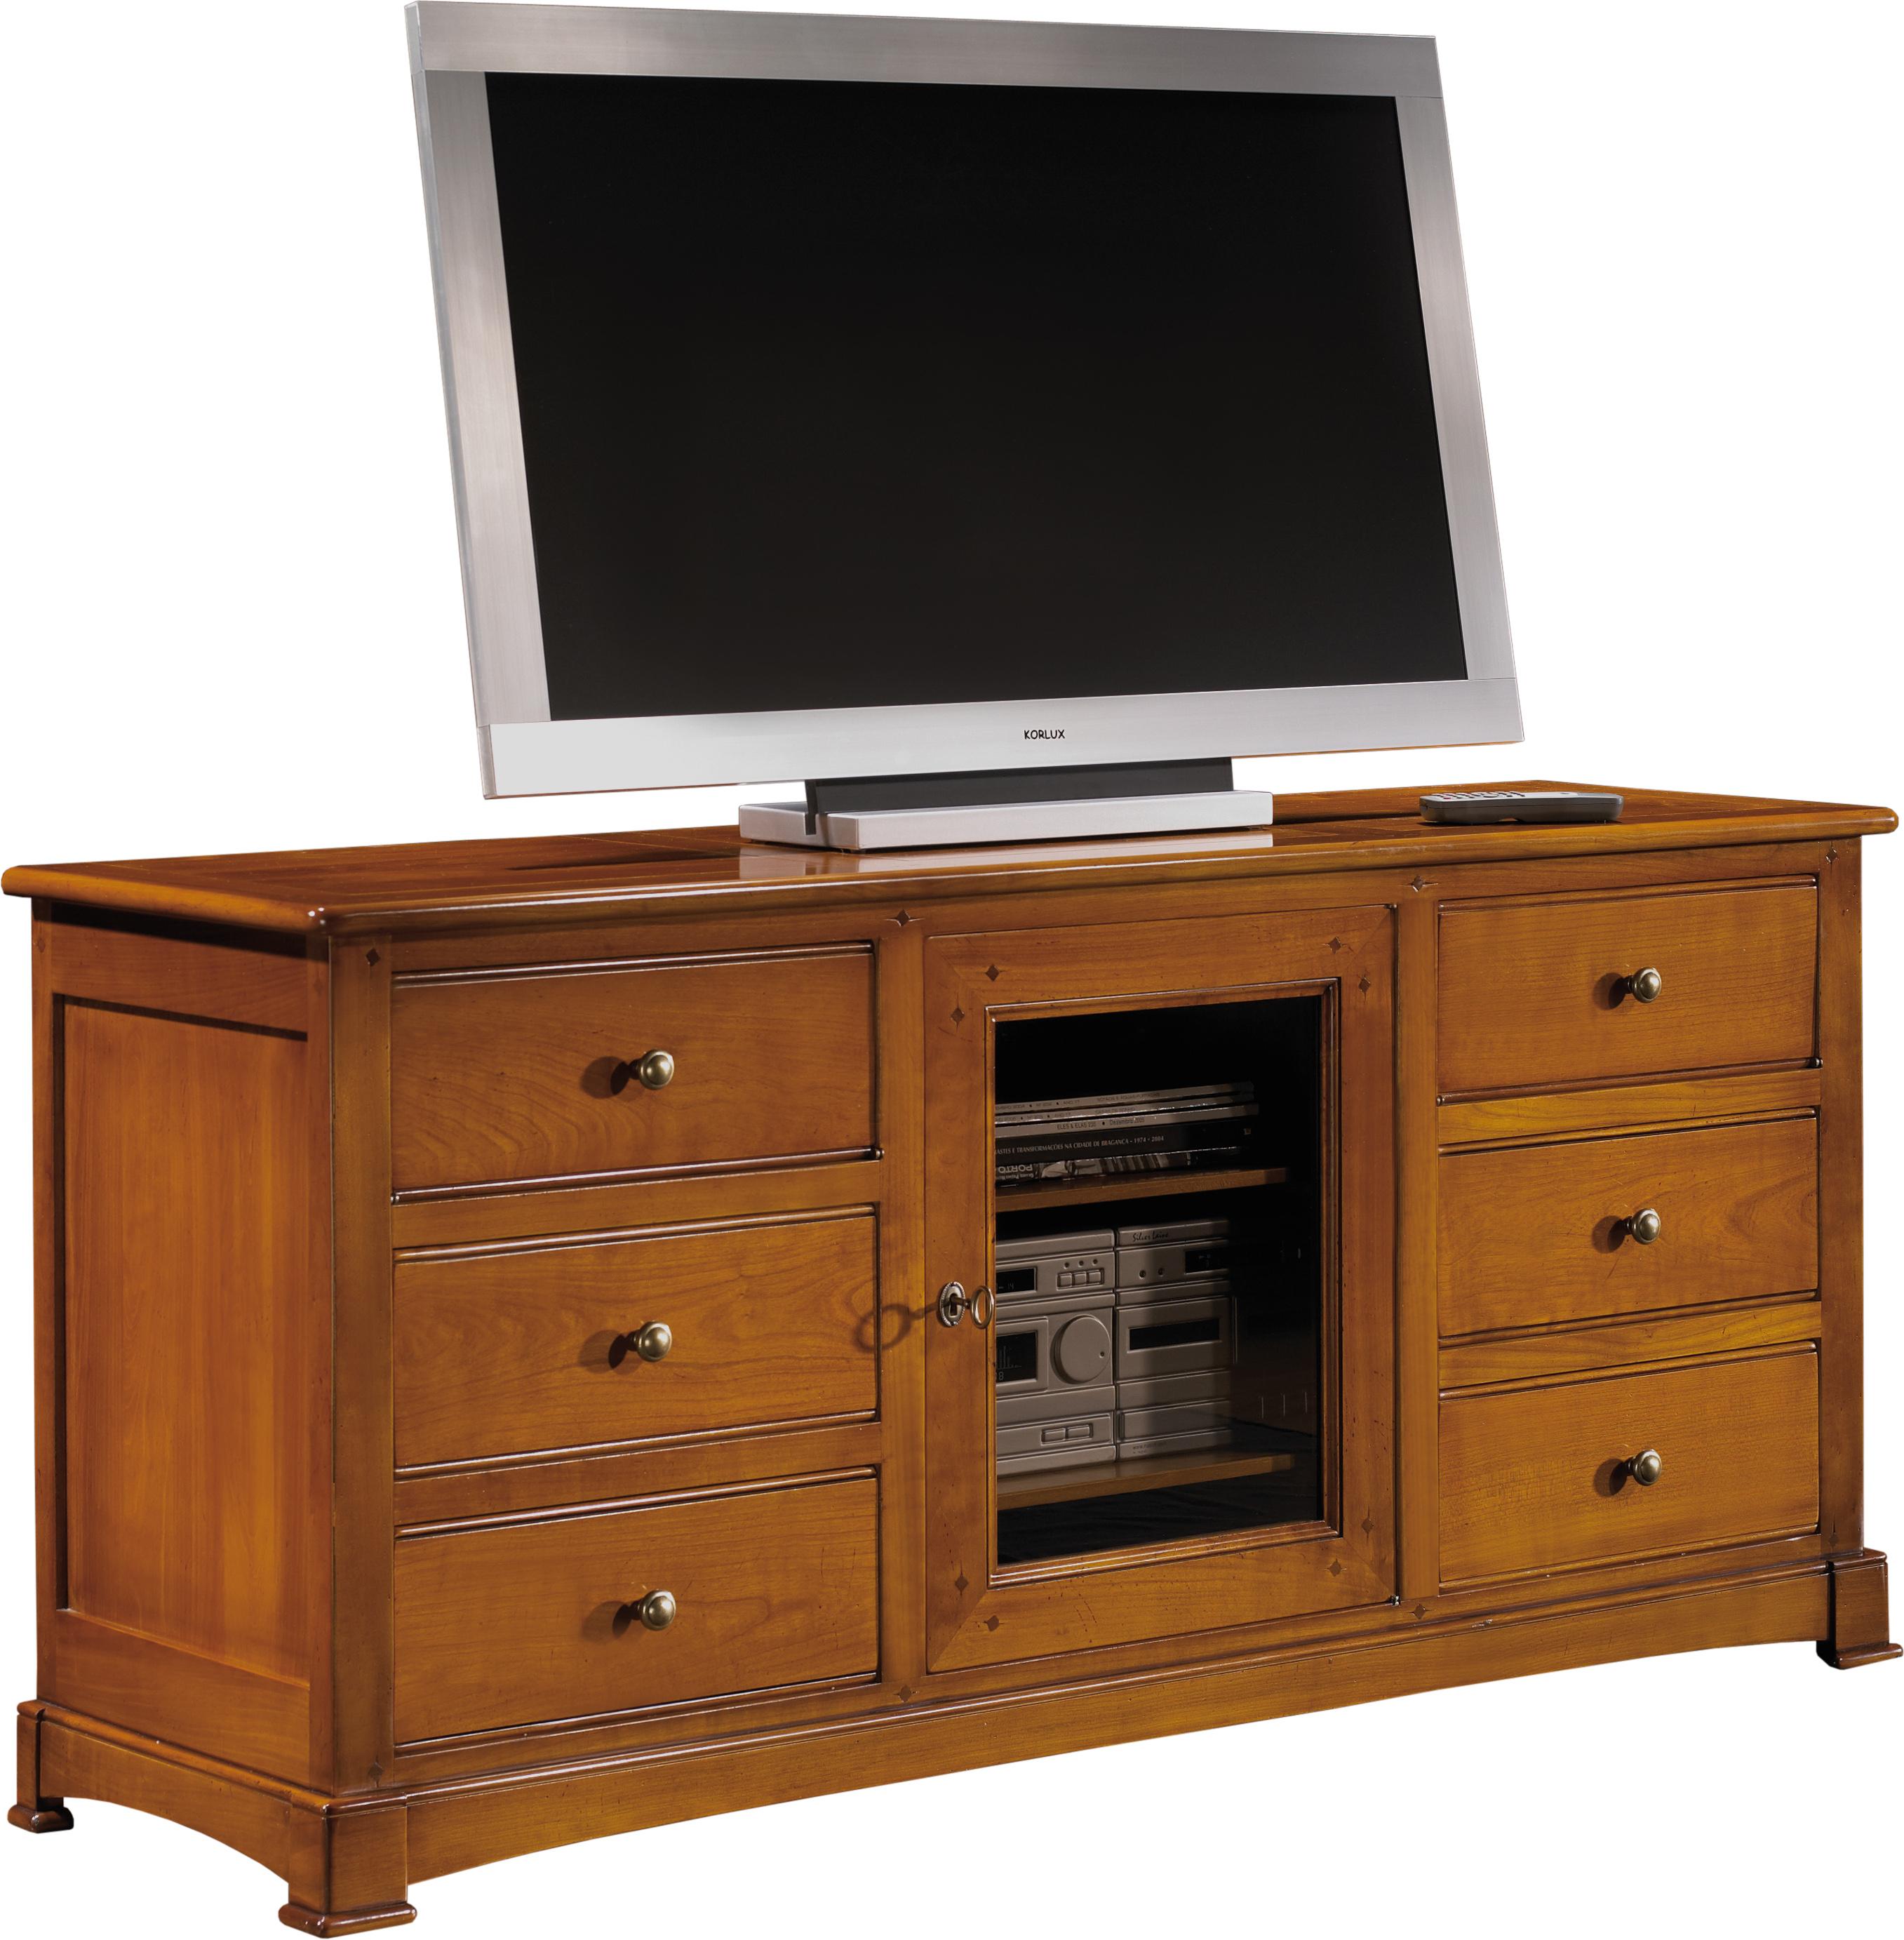 Meuble tv meuble tv hifi porte verre meuble tv hifi for Meuble hifi porte